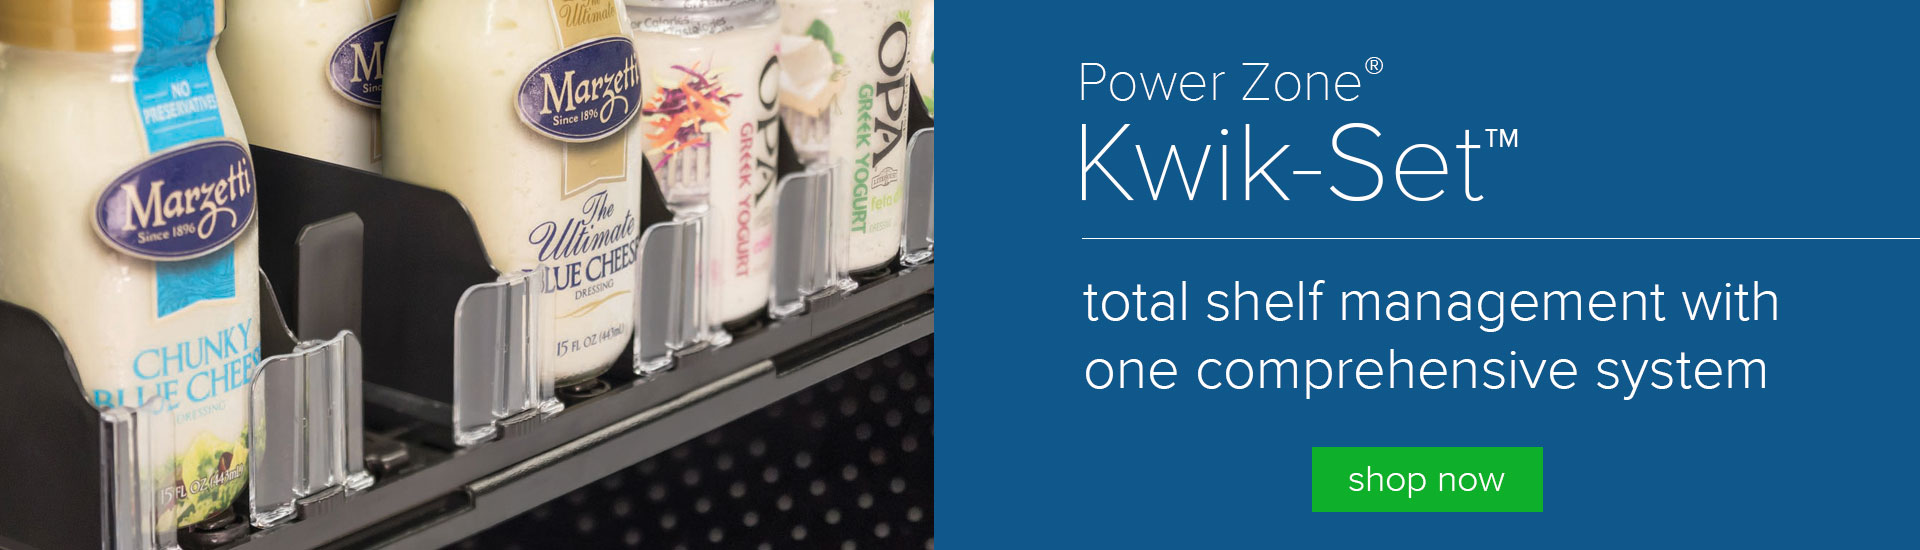 Power Zone Kwik-Set